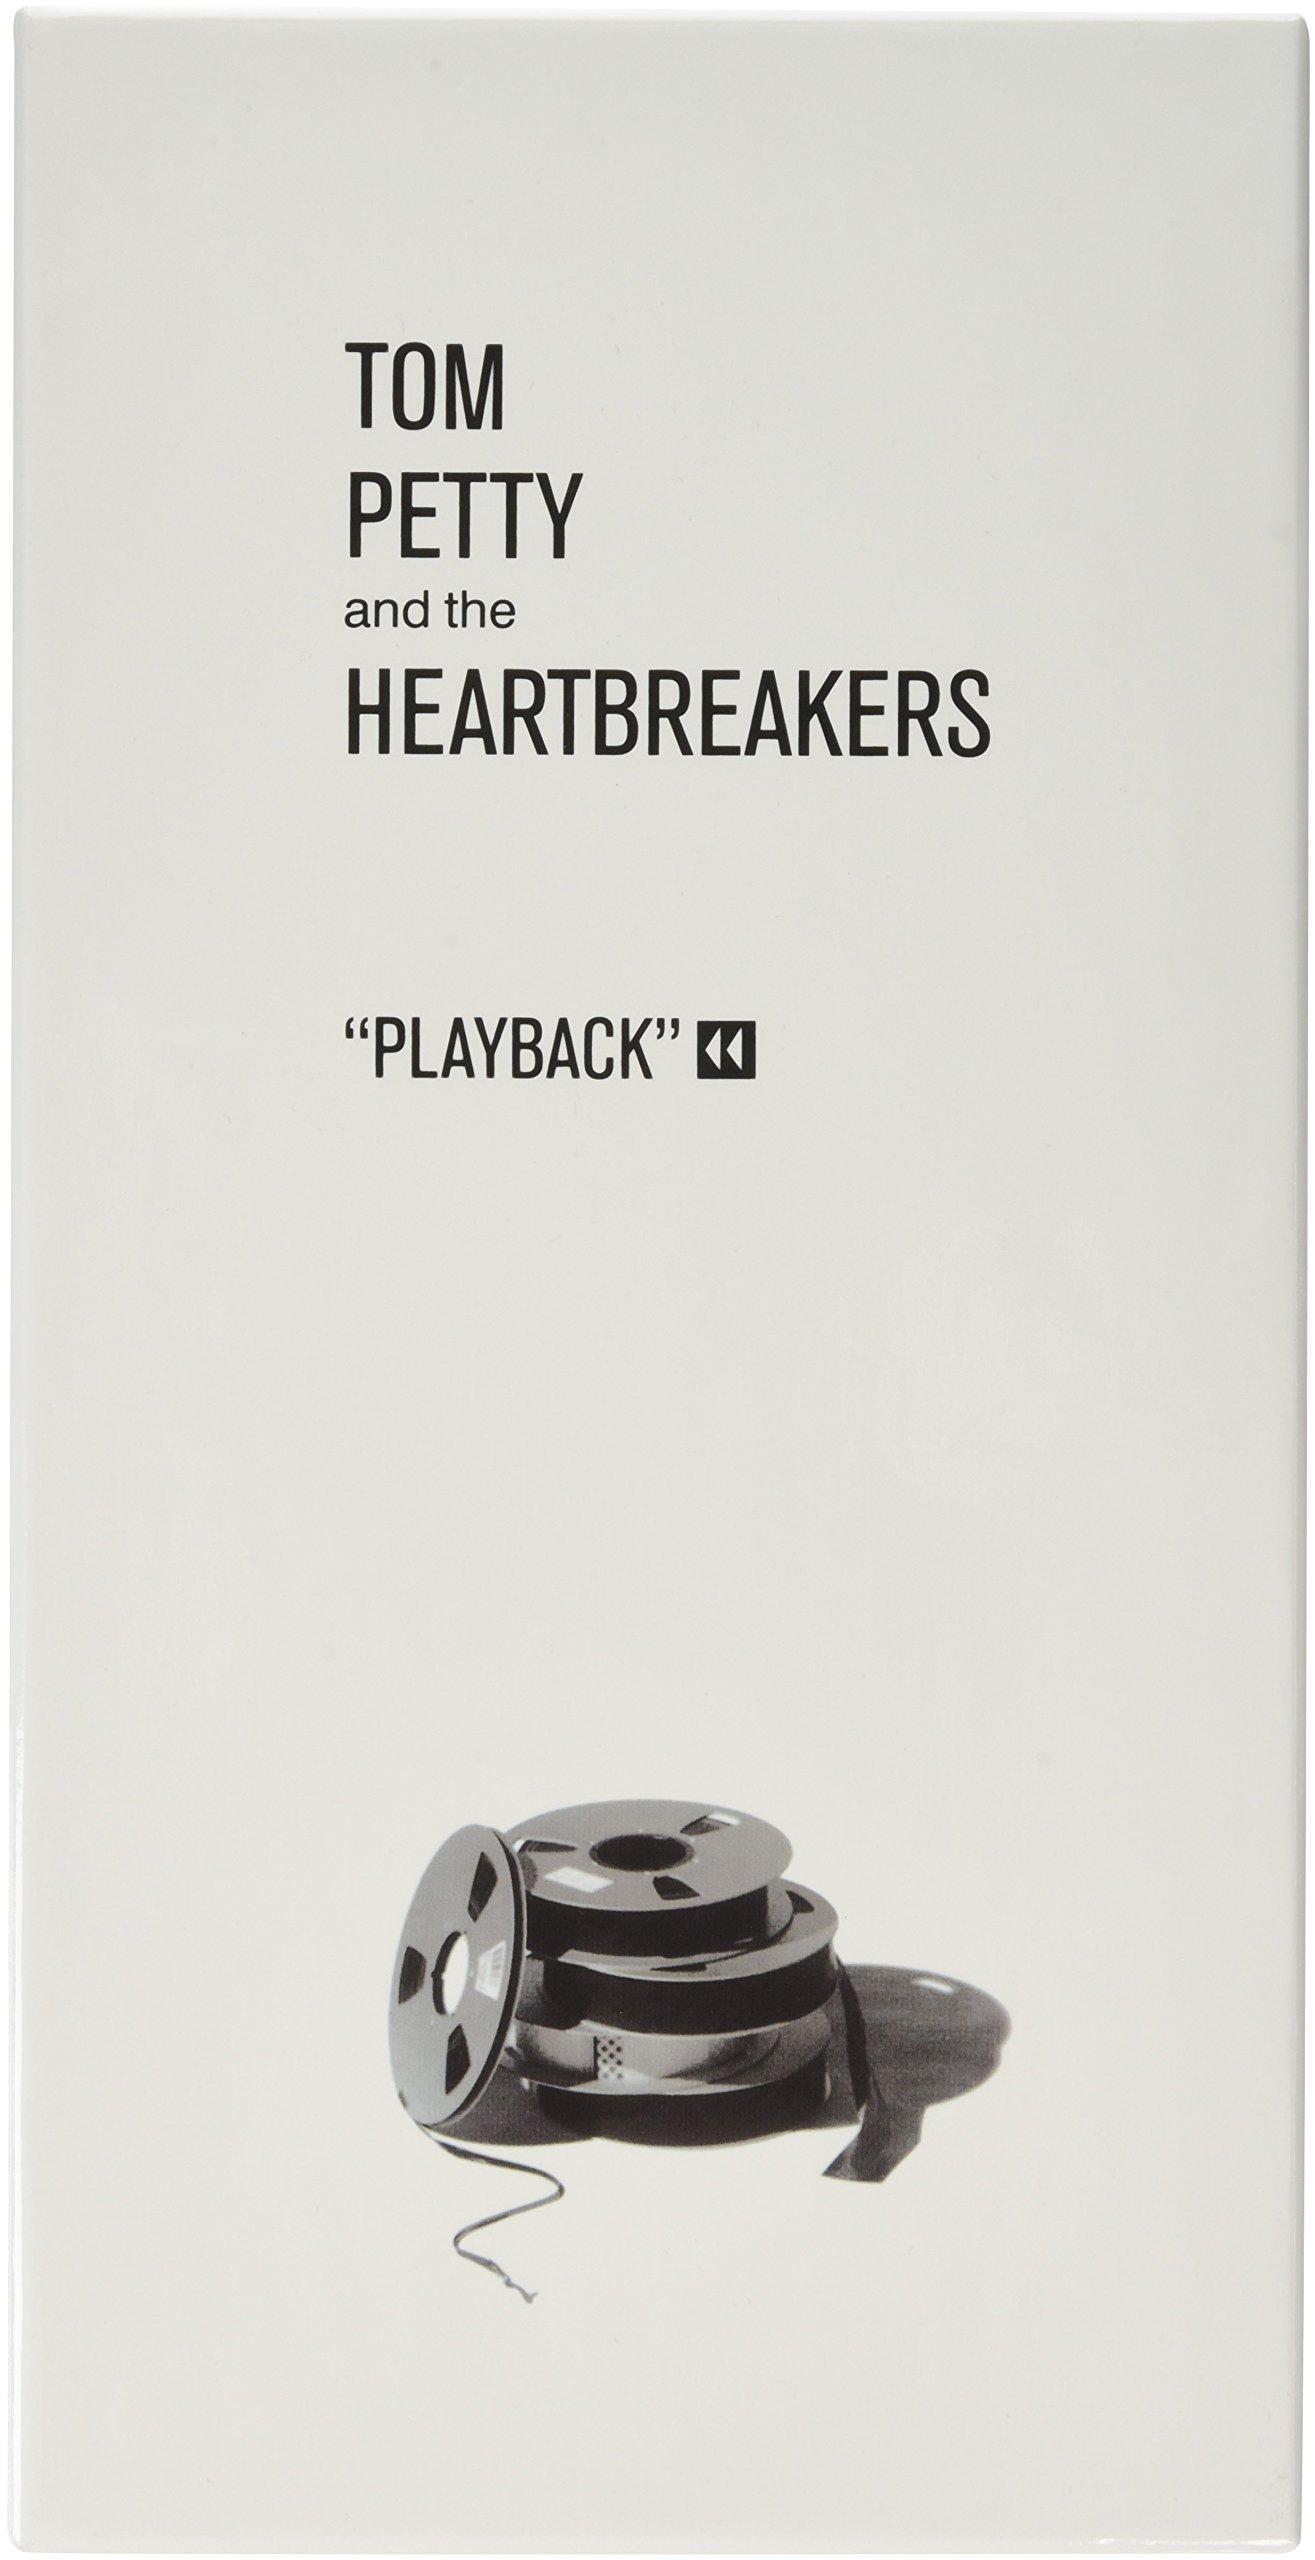 Playback [6 CD Box Set] by MCA